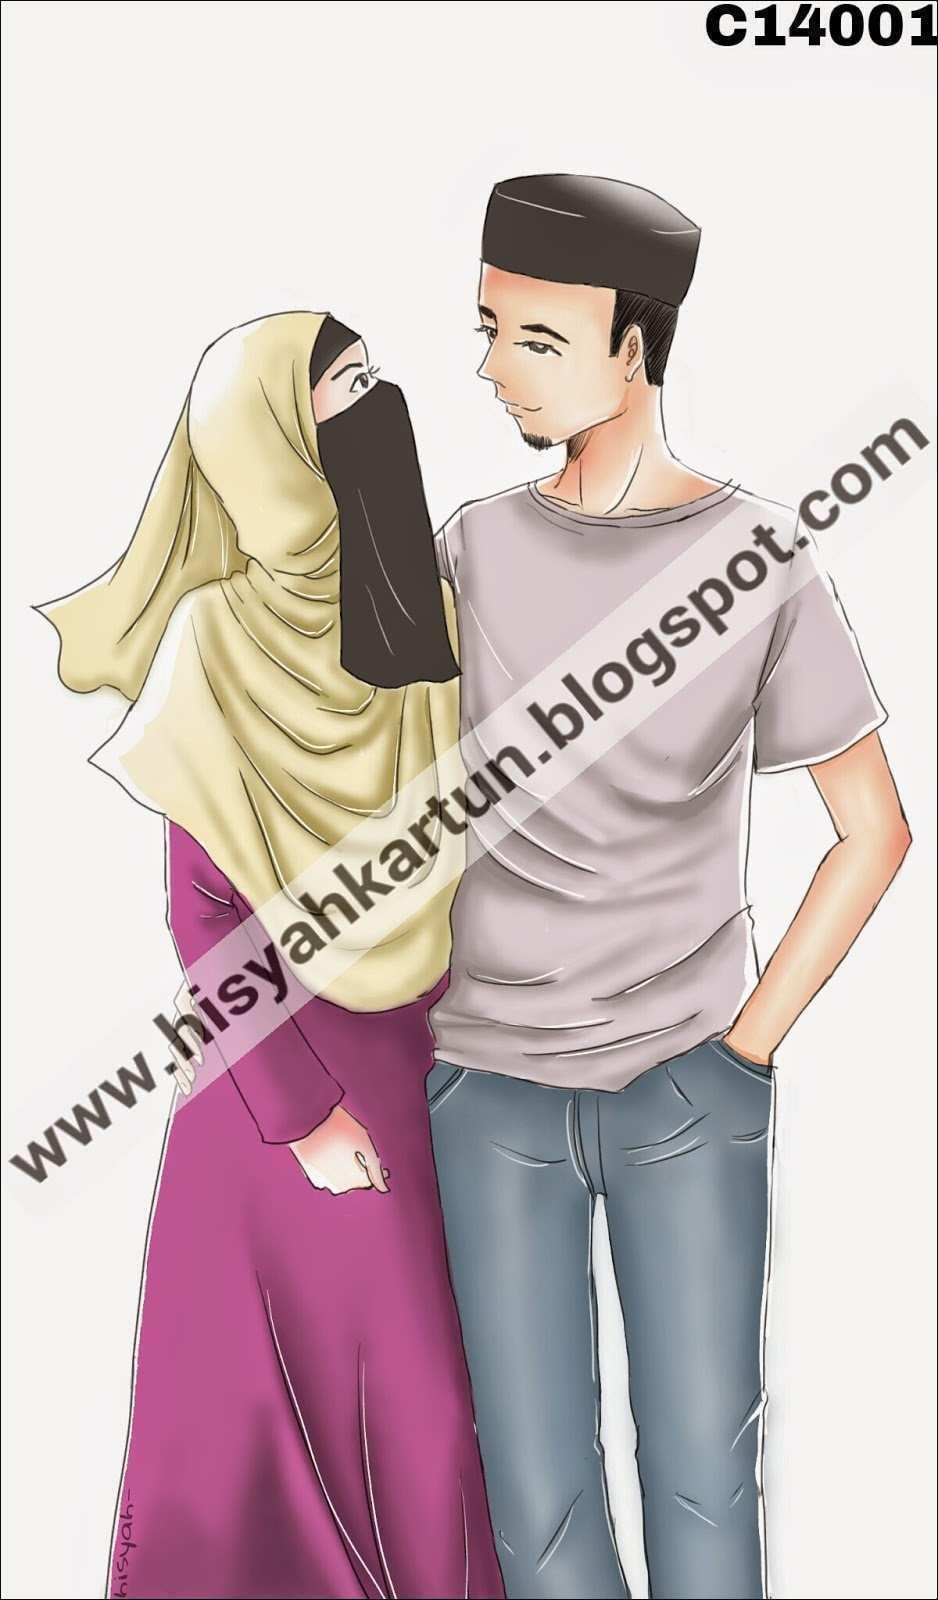 Gambar Kartun Muslimah Bergerak Terupdate Gambar Bergerak